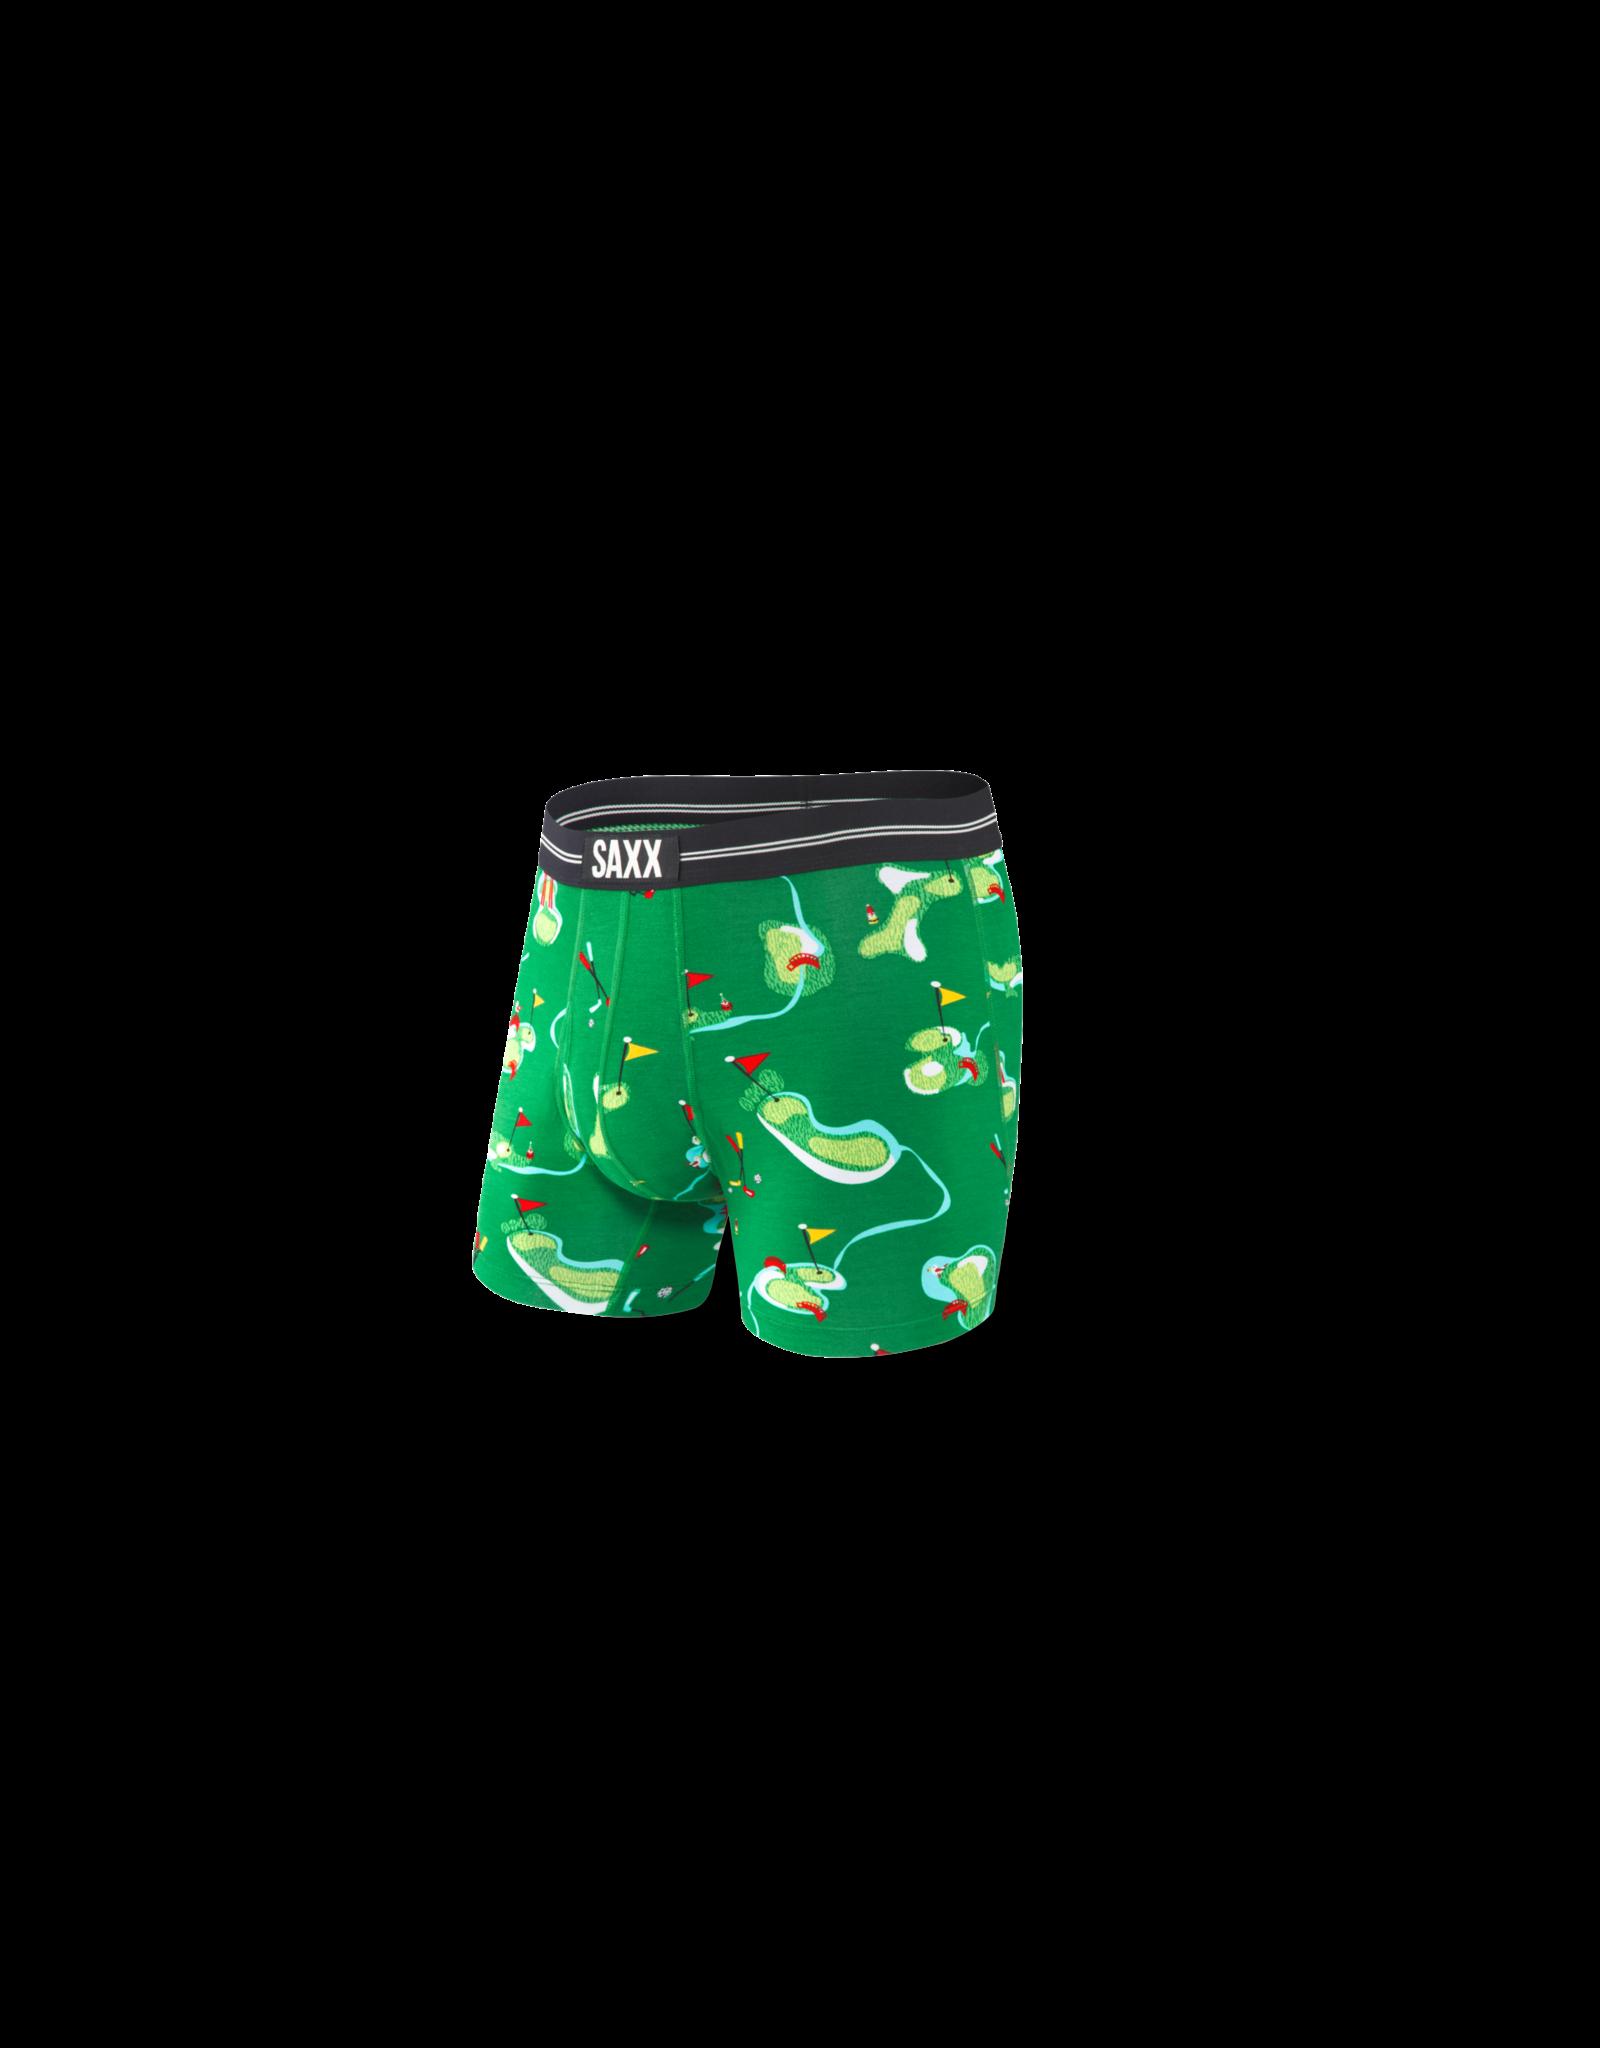 Saxx Saxx Ultra Boxer Brief Fly - Green Putt Putt